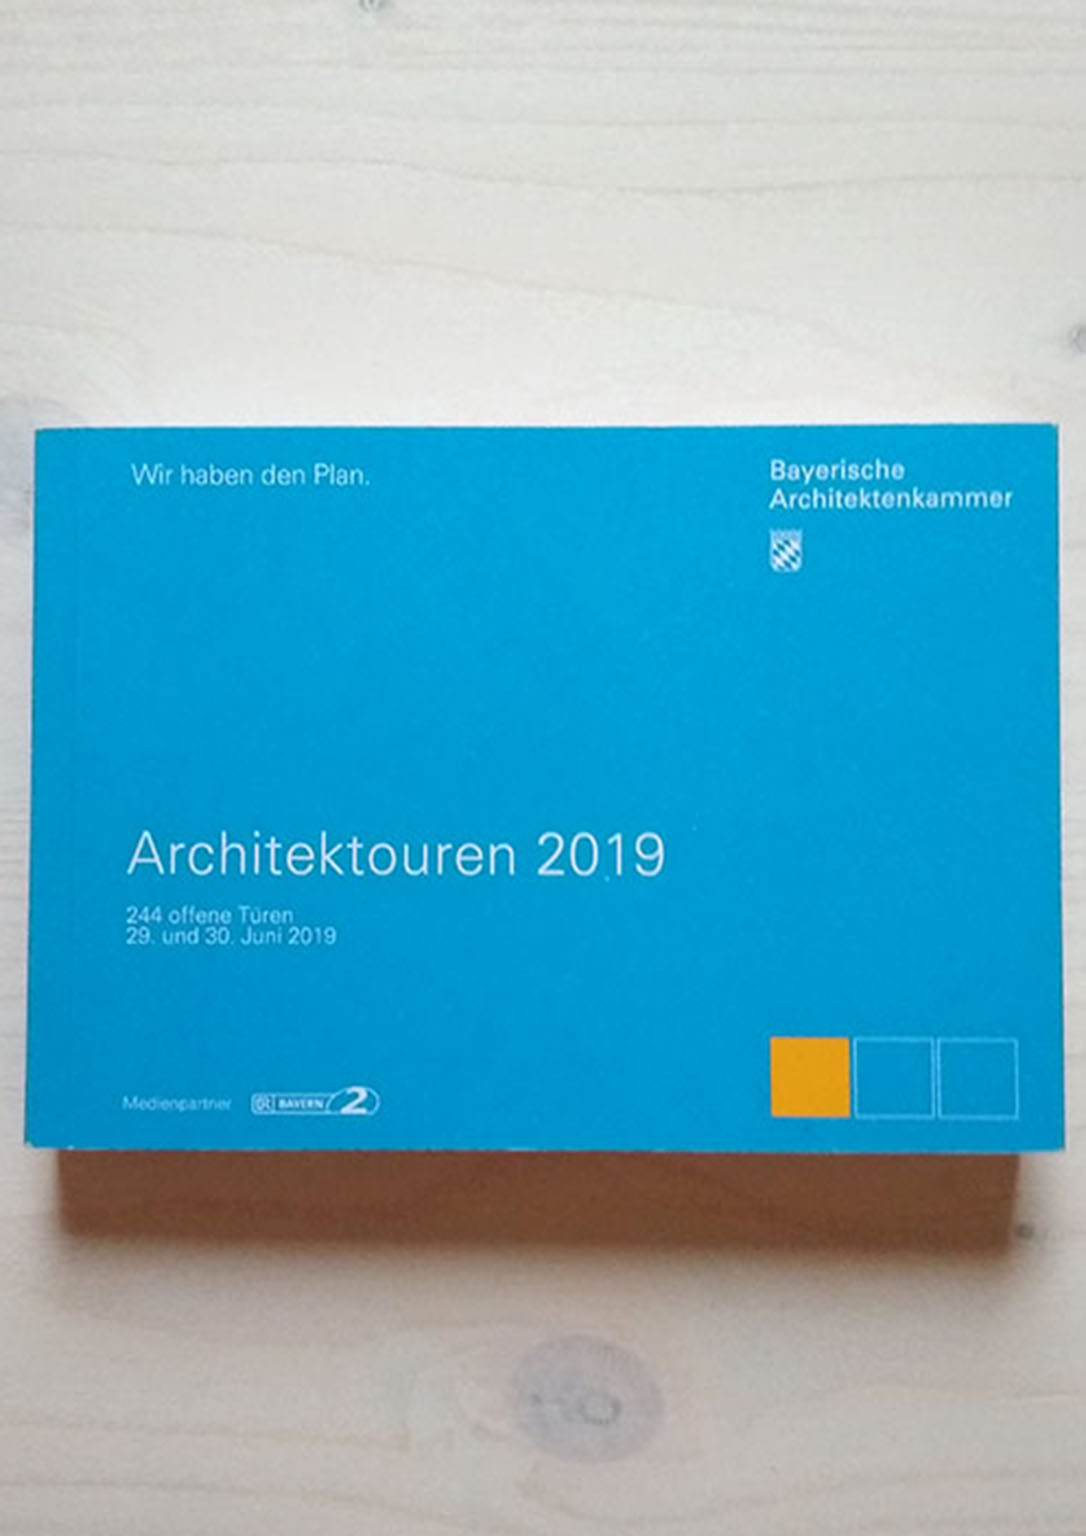 Architektouren 2019